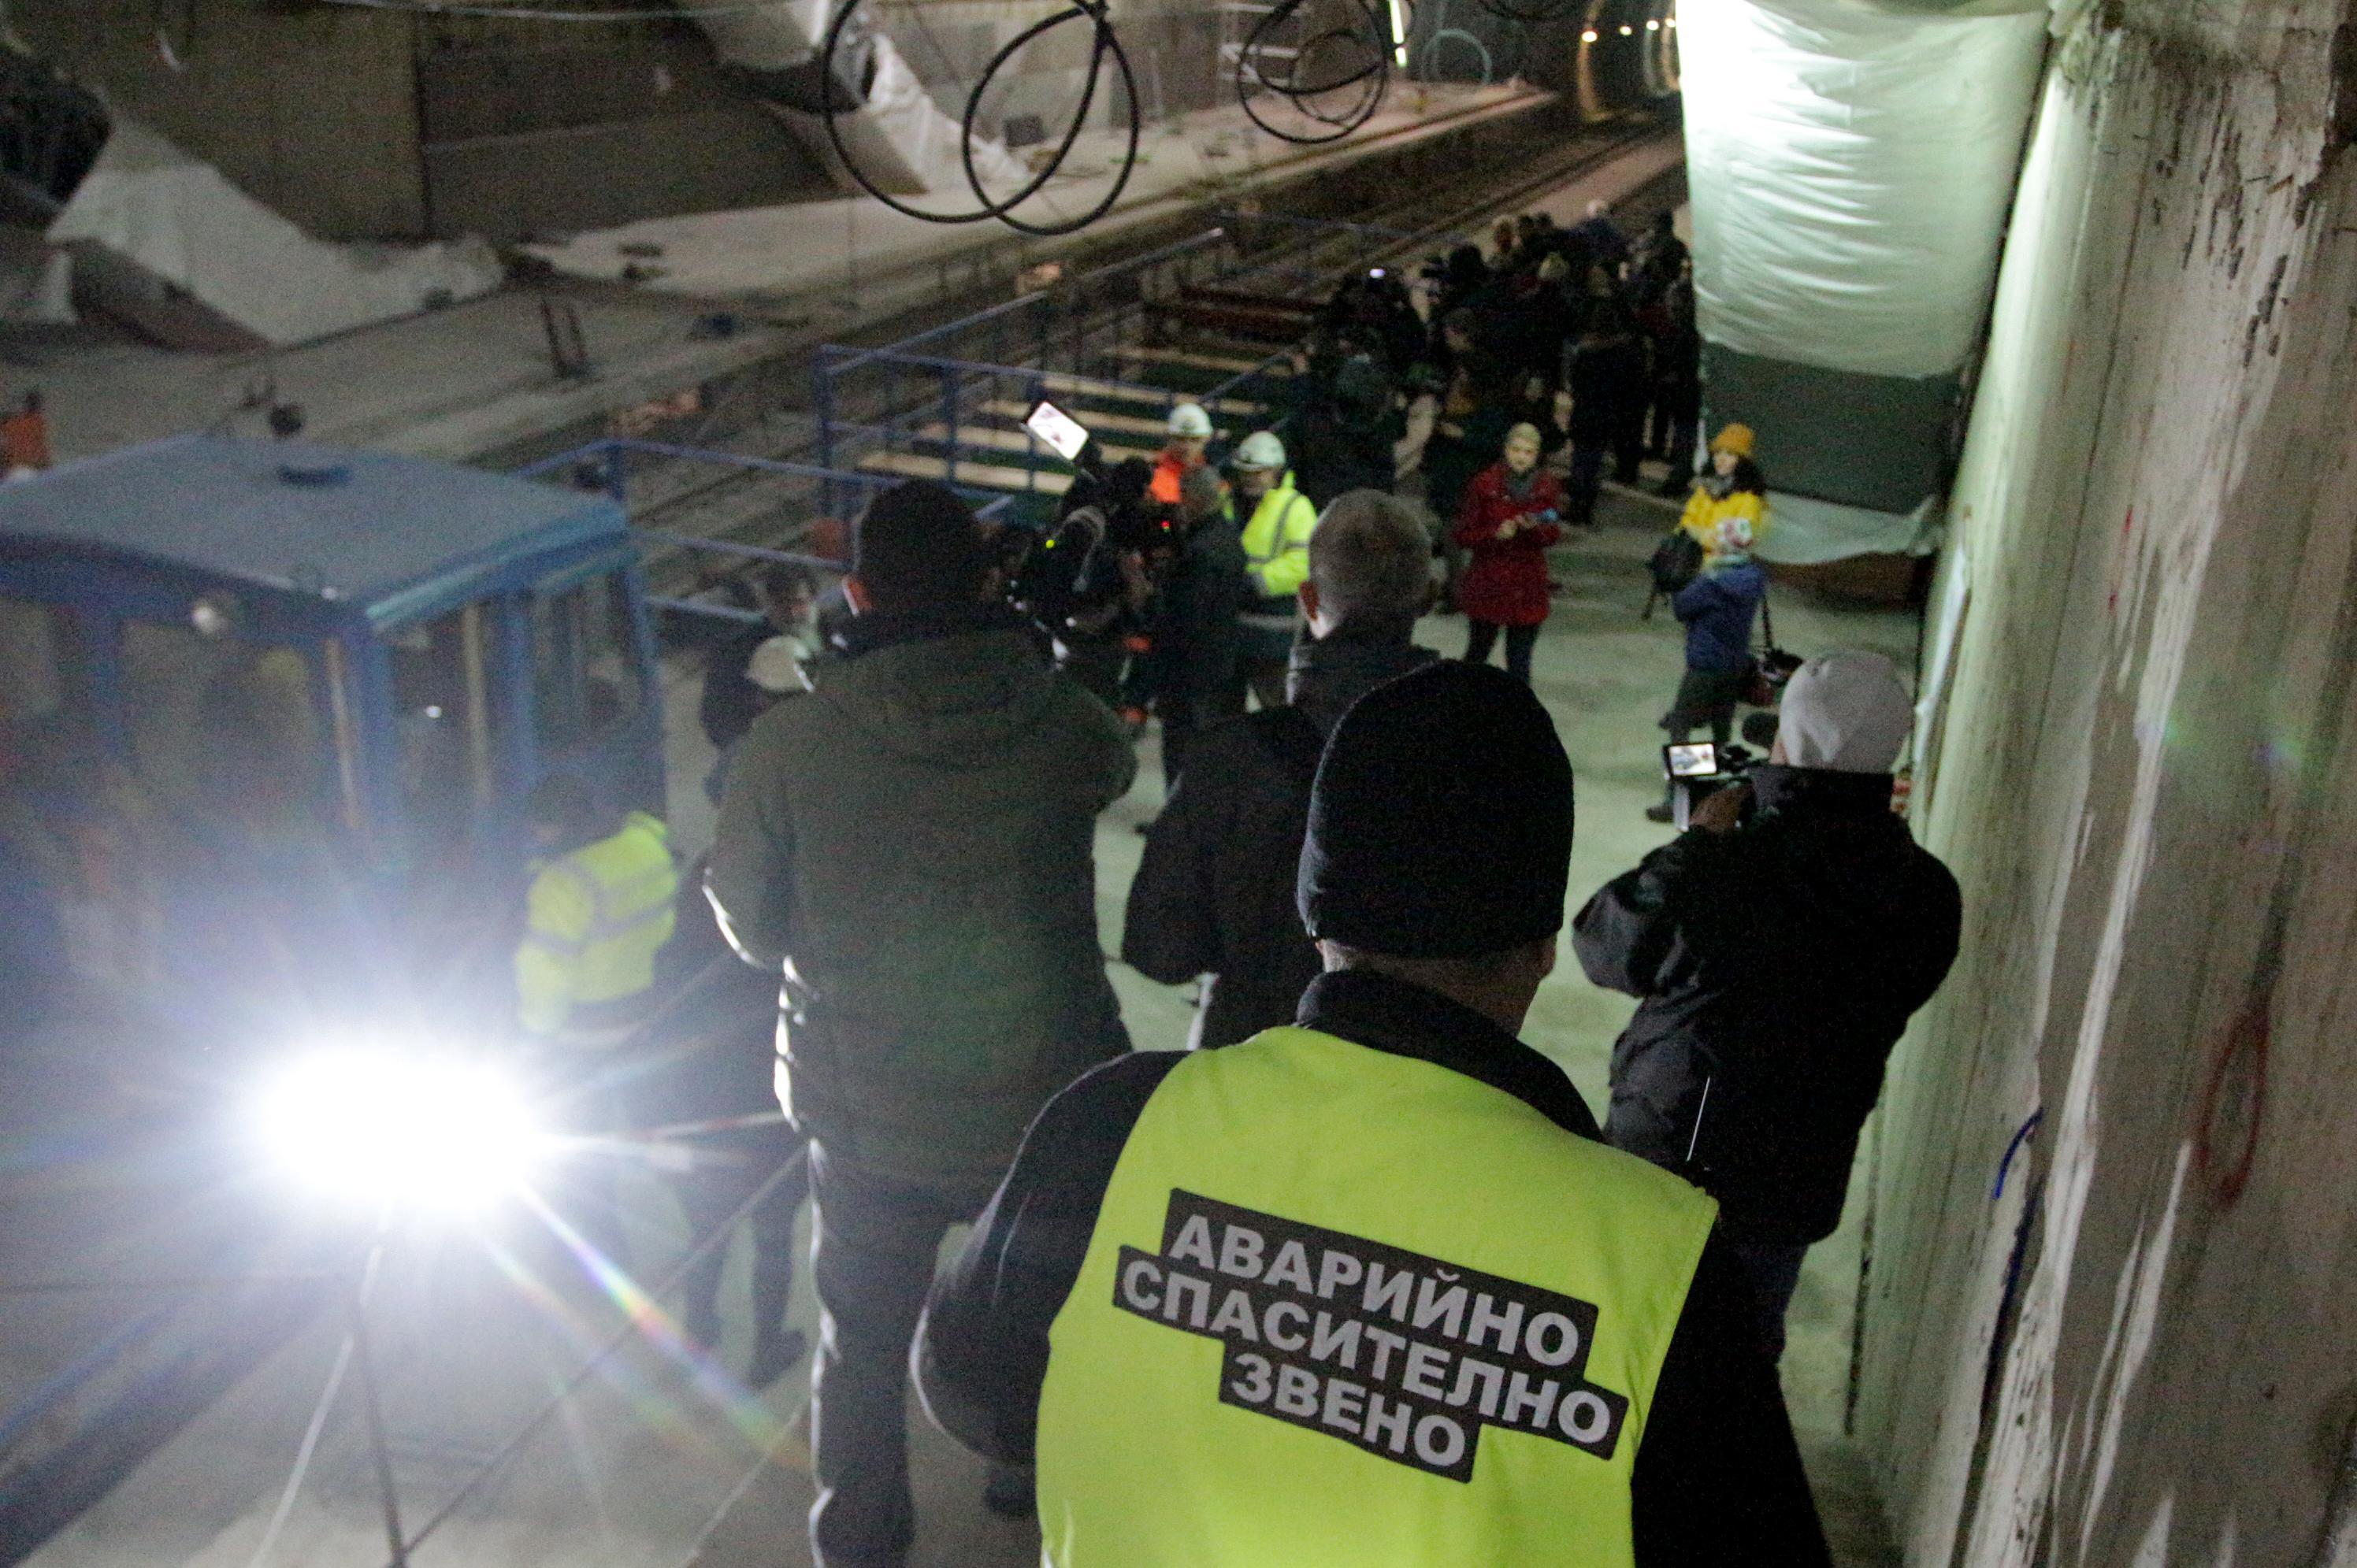 метростанция на бул. България